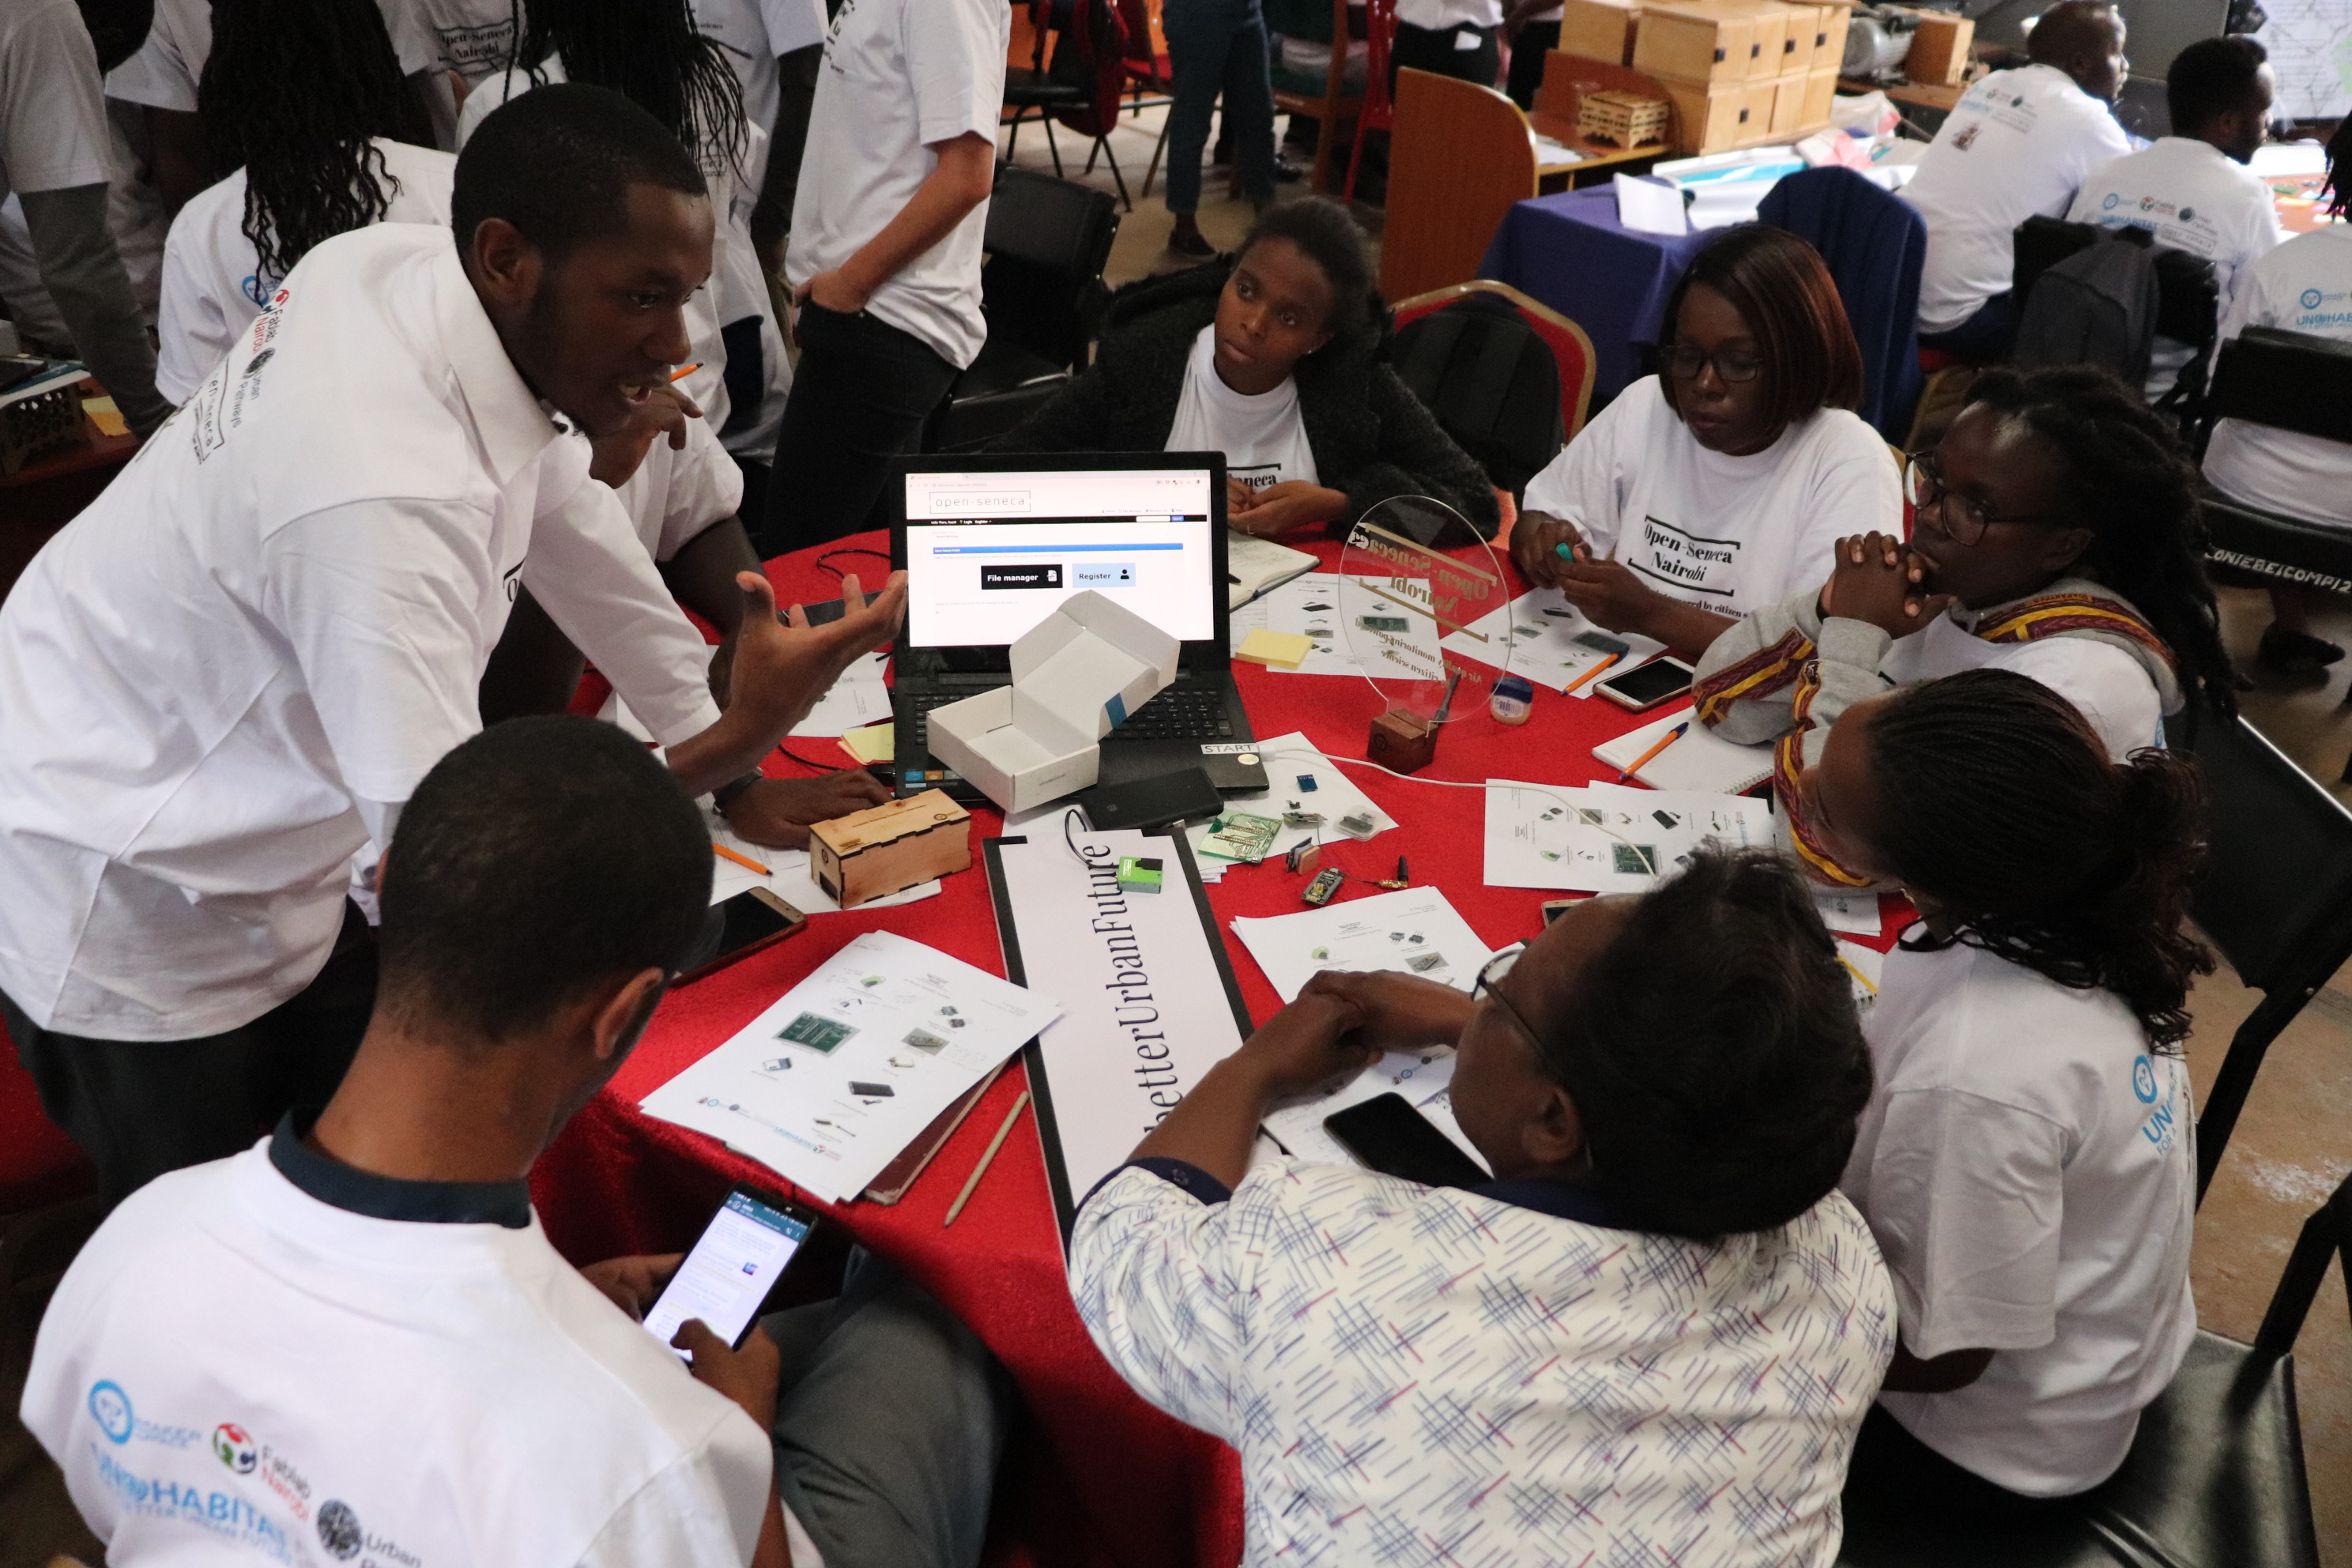 Sensor building workshop at the Makespace in Nairobi